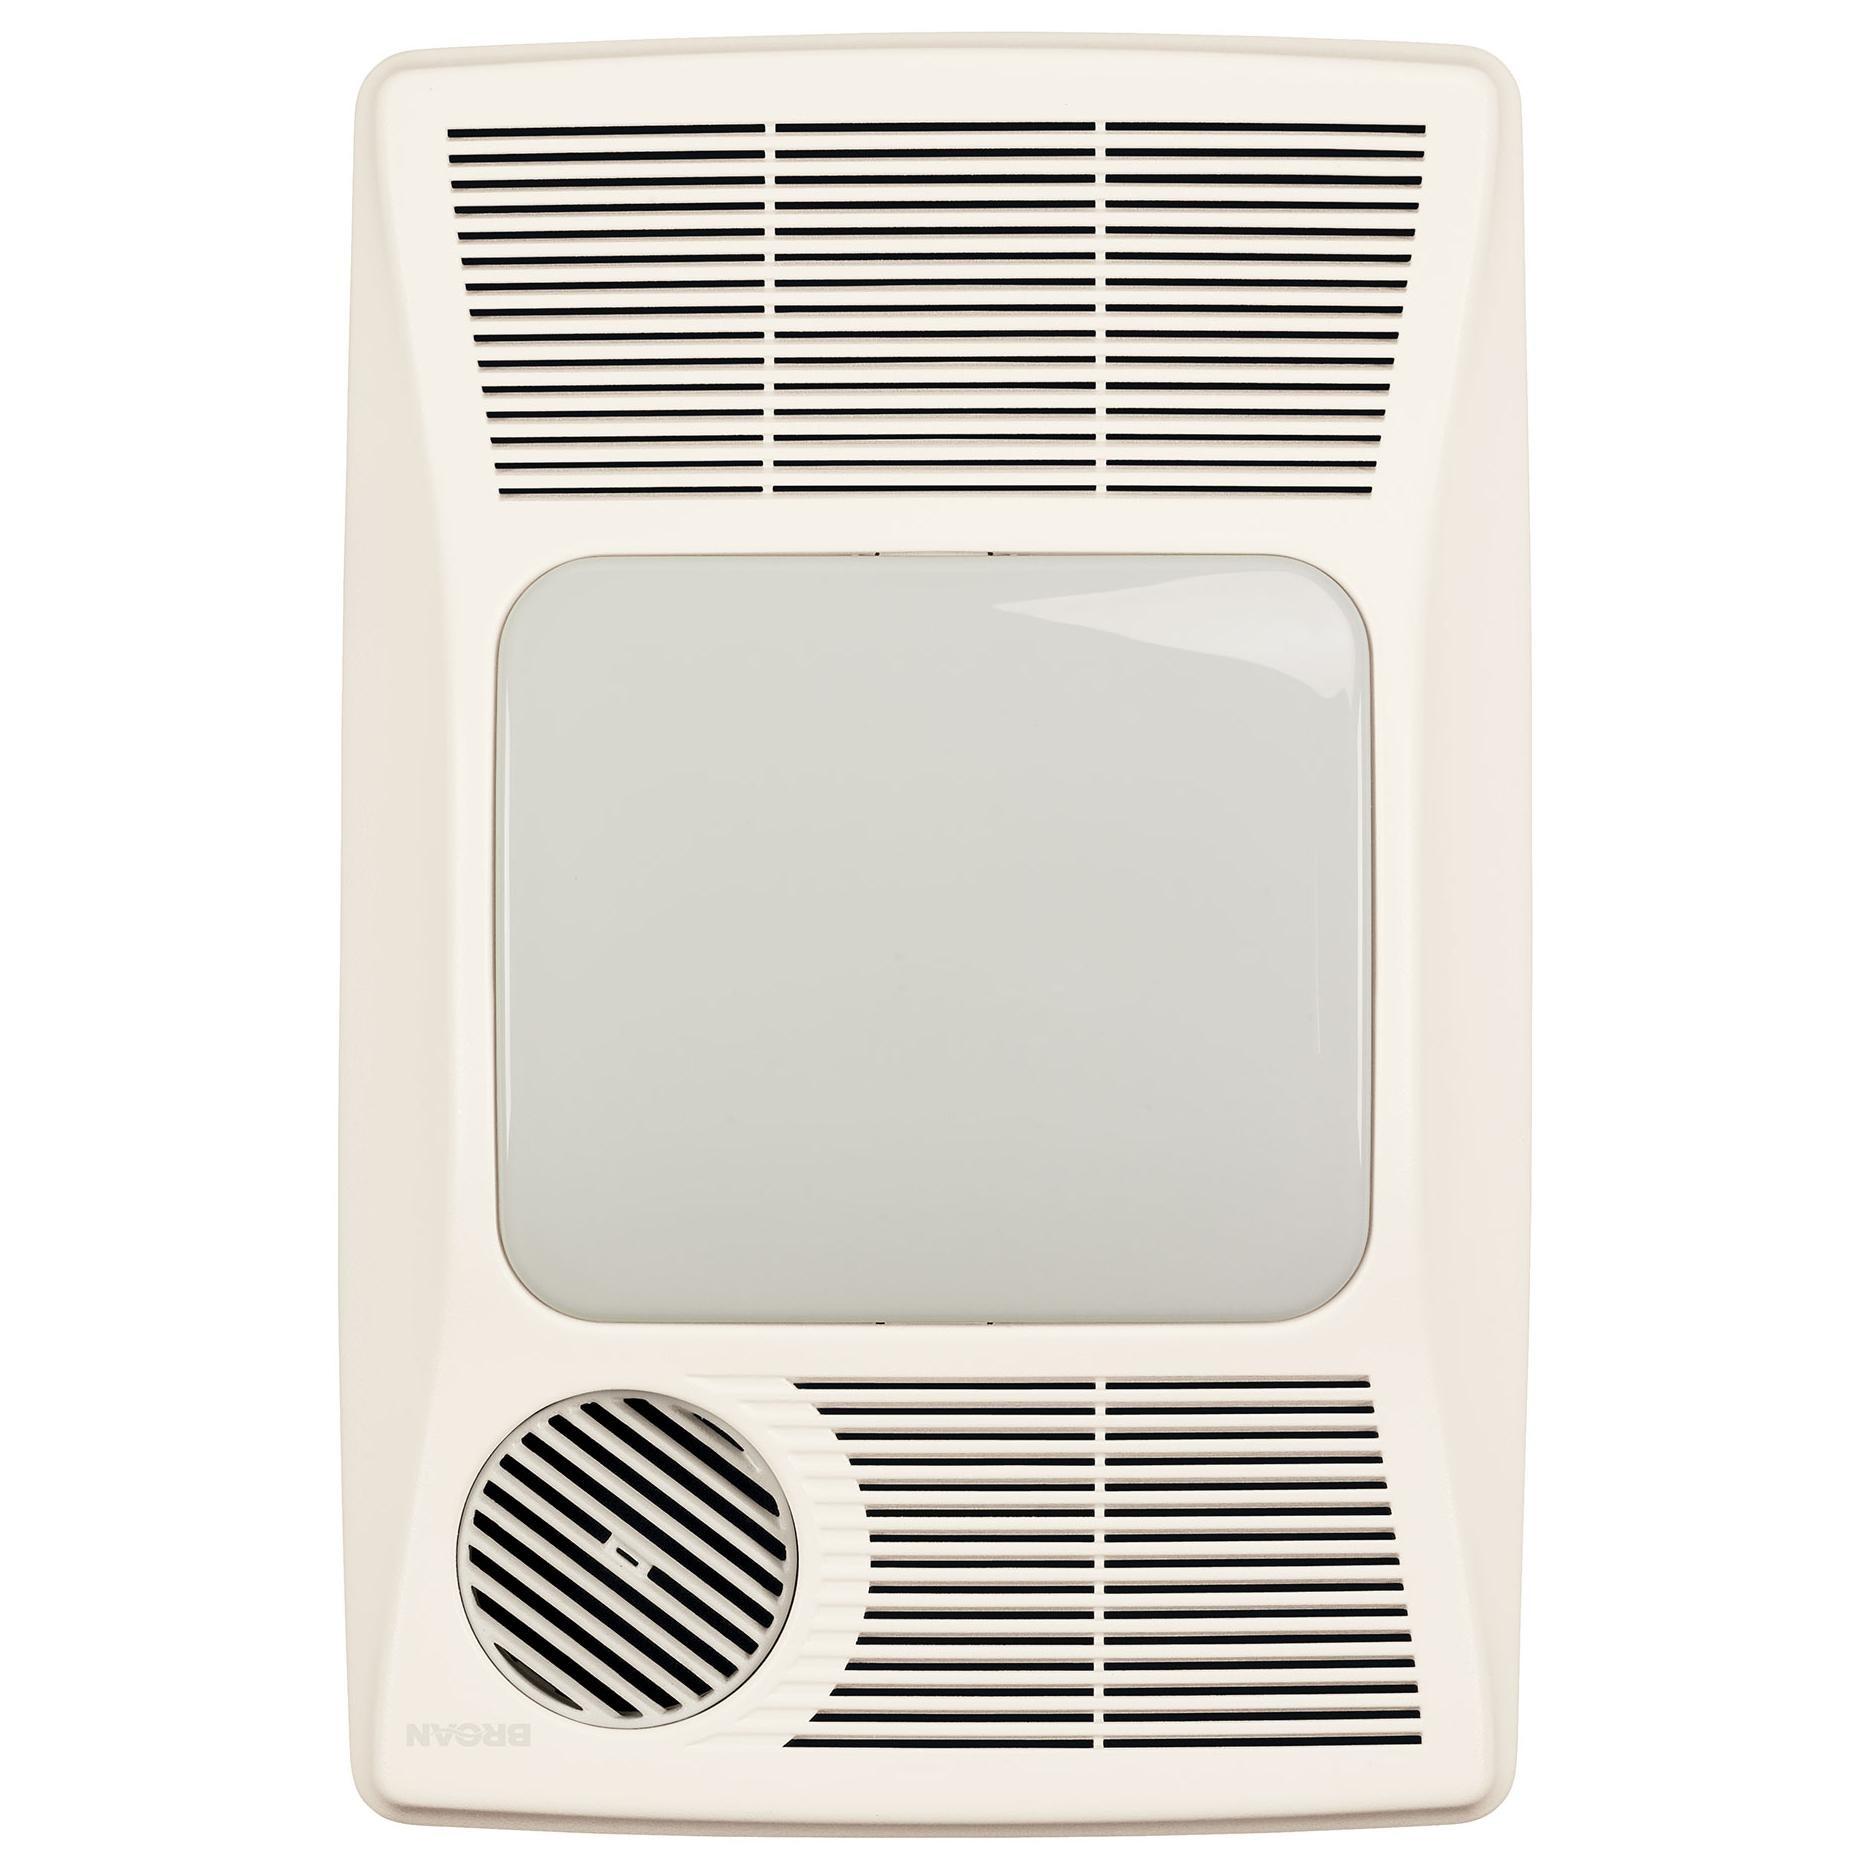 Broan Bathroom Fans Finest Amazon Broan Hl Directionally Adjustable Bath Fan with Ideas